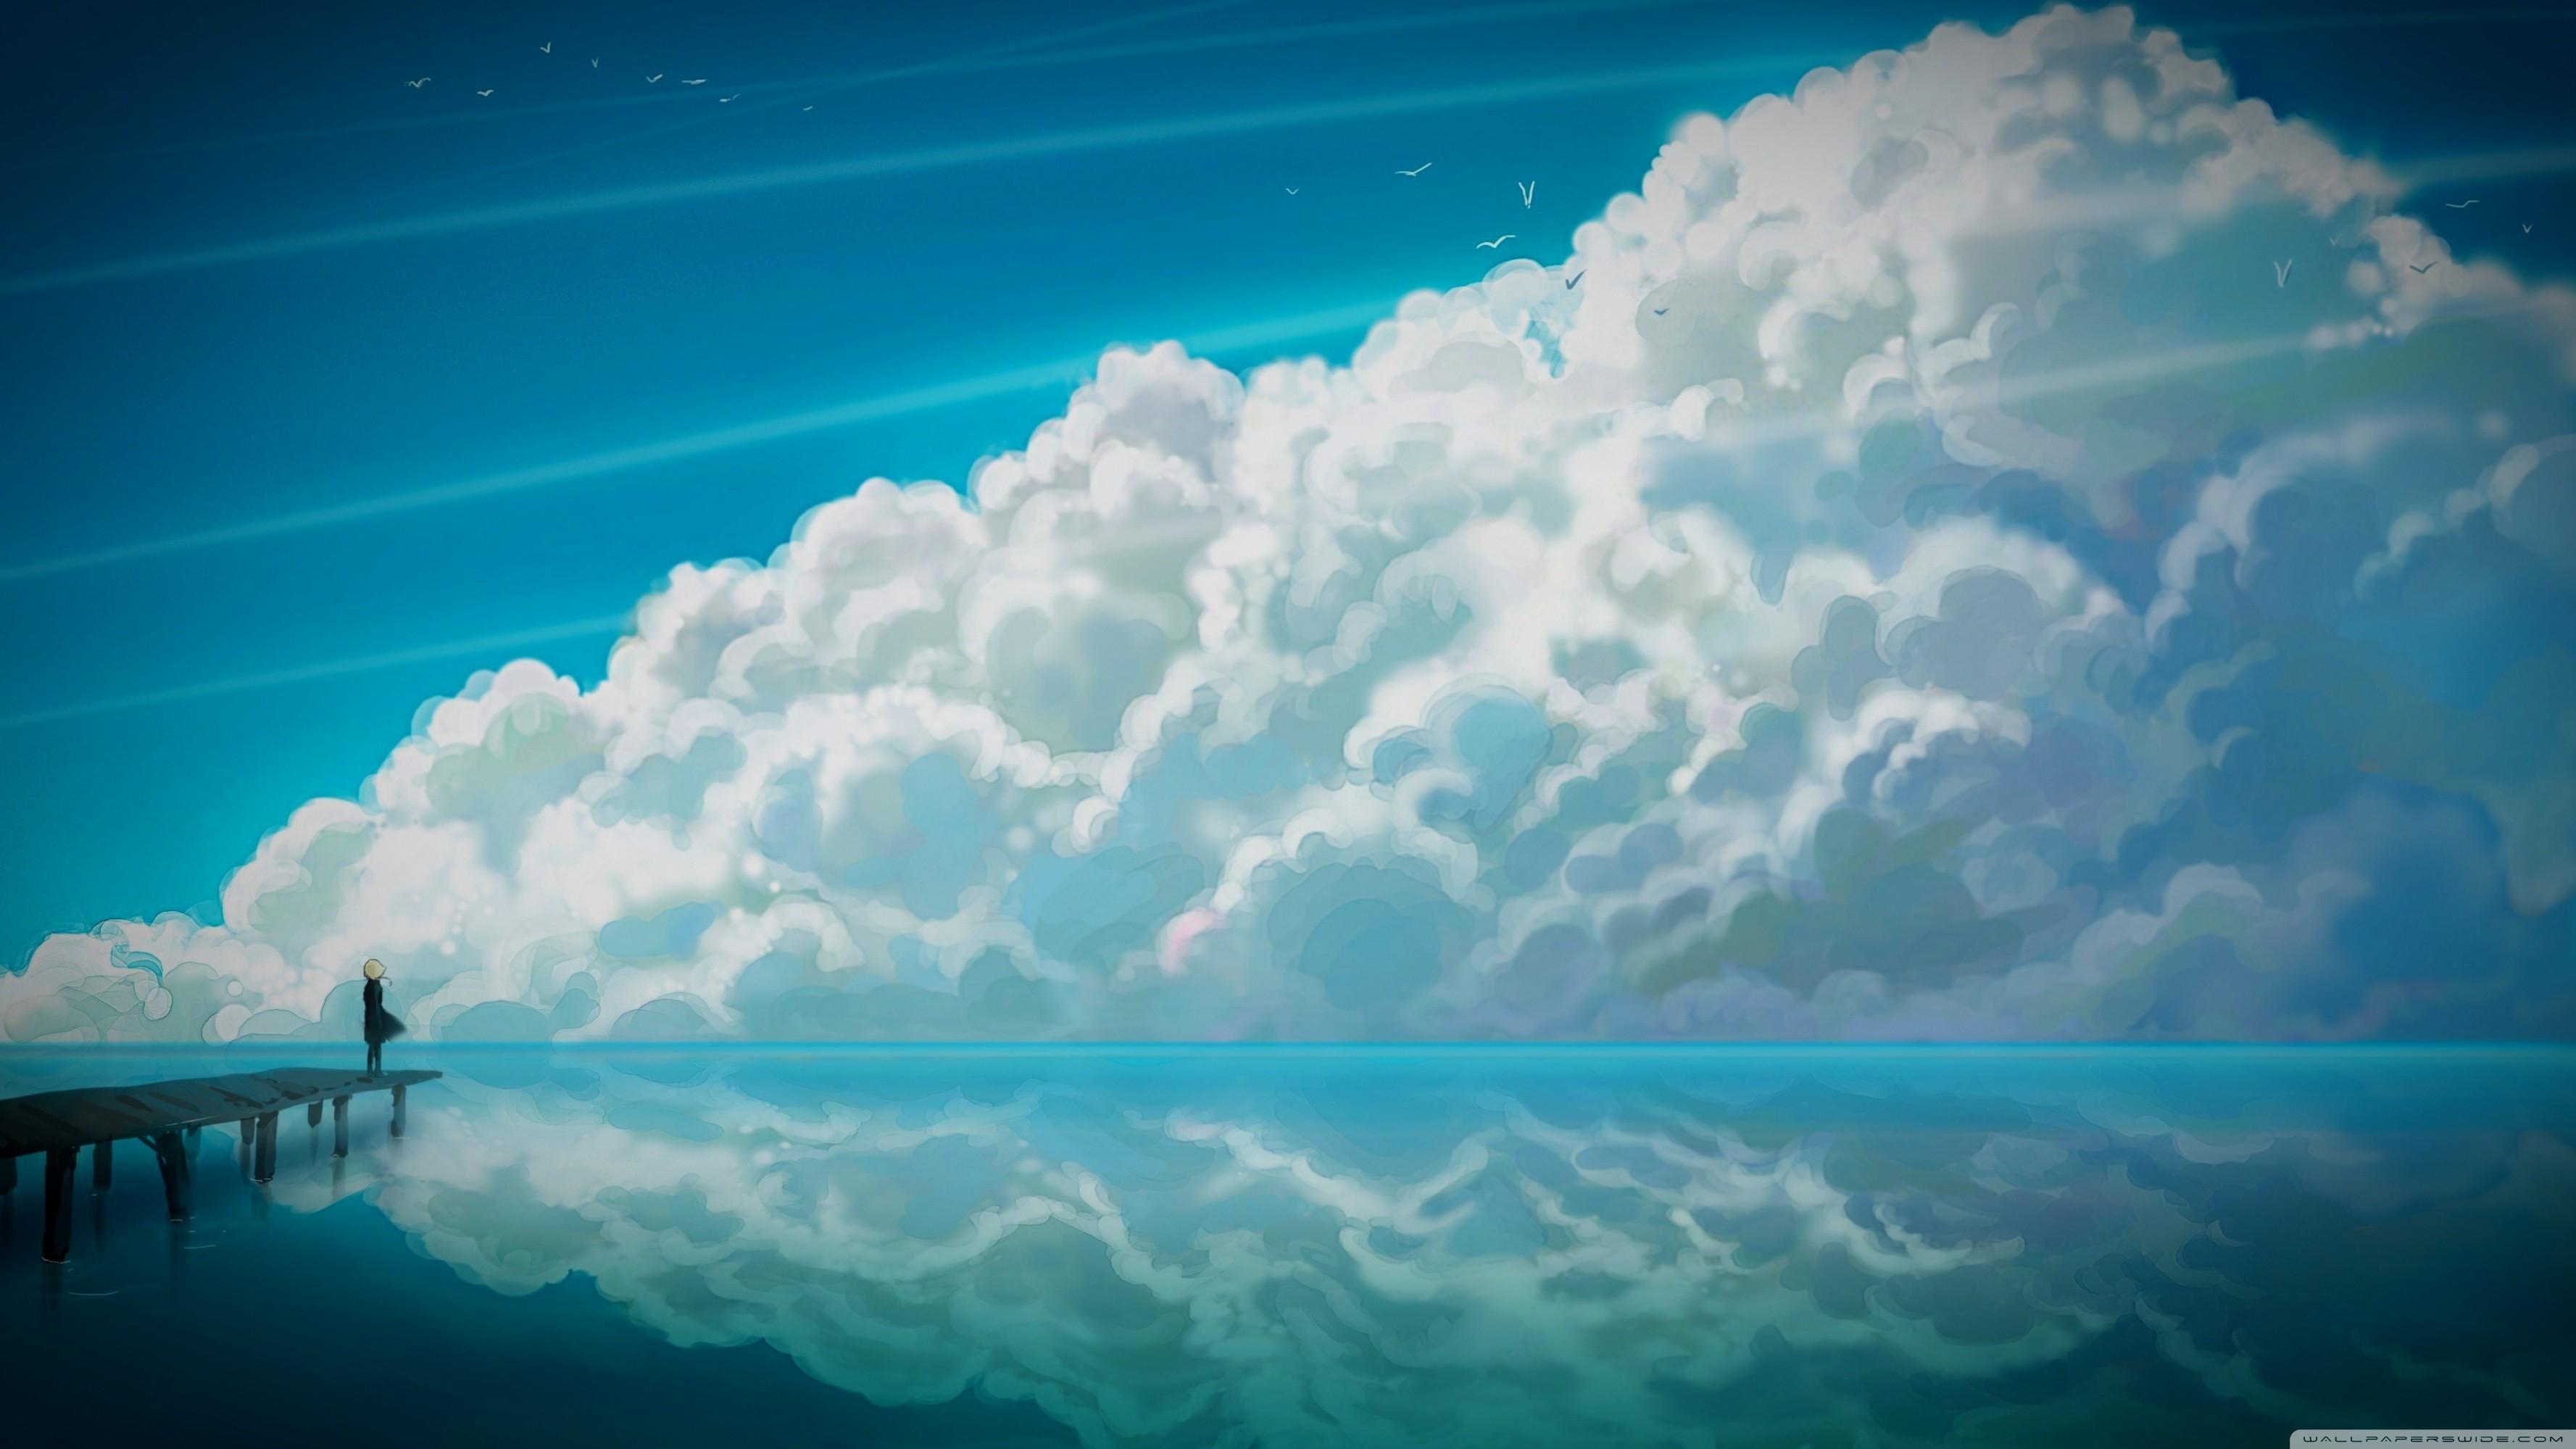 Wallpaper sunlight sea anime reflection sky clouds - Anime sky background ...